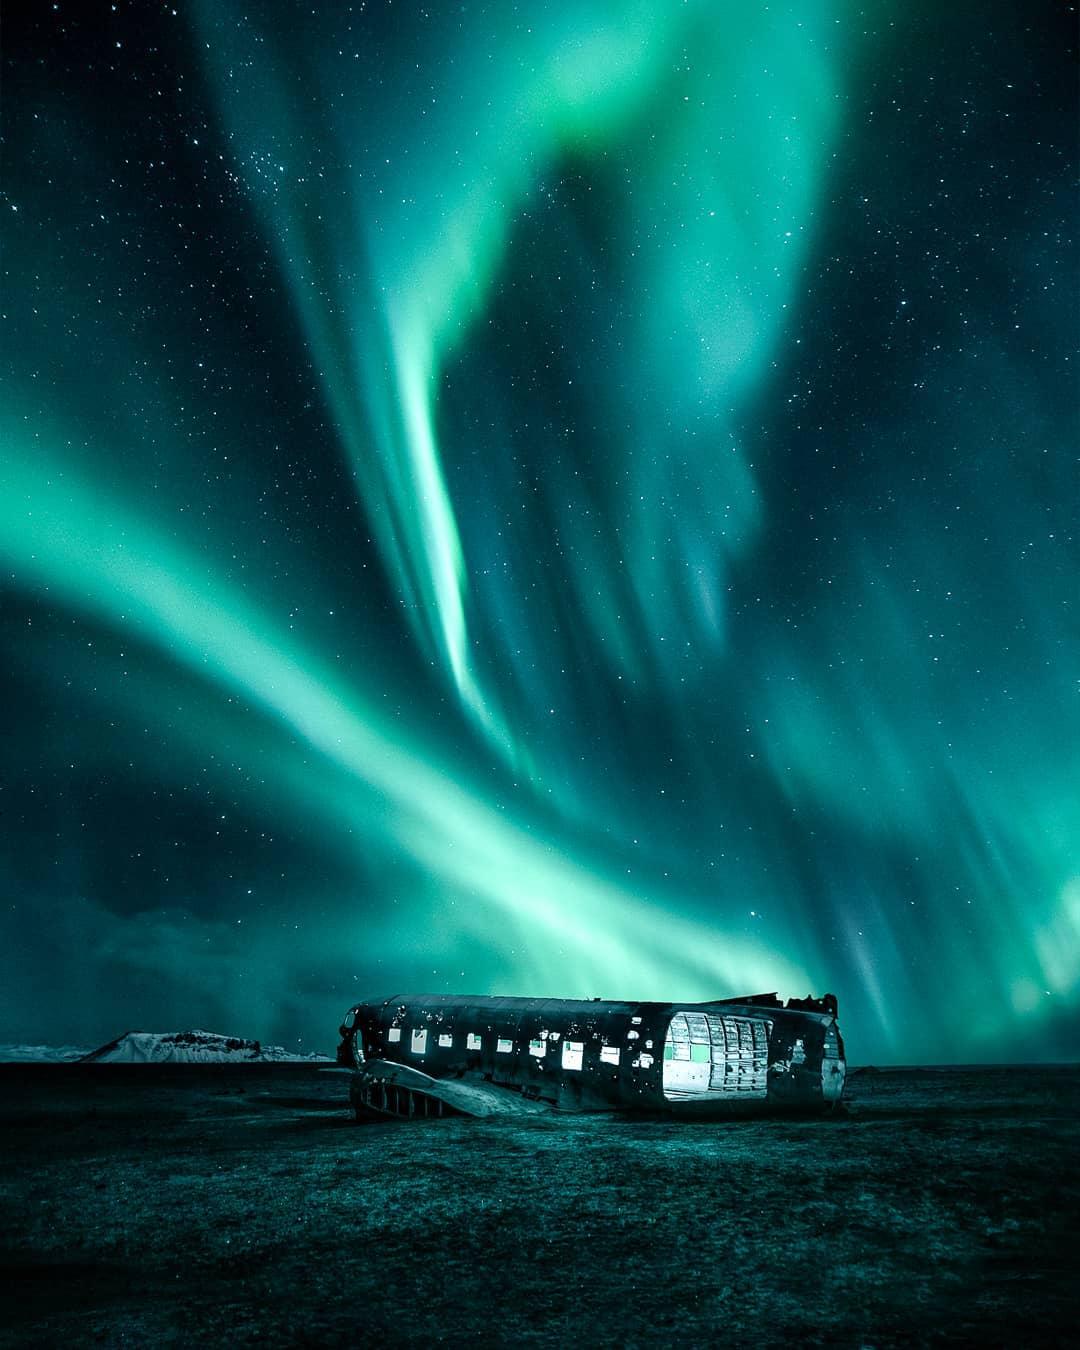 Фантастические пейзажные снимки от Микко Ристамяки